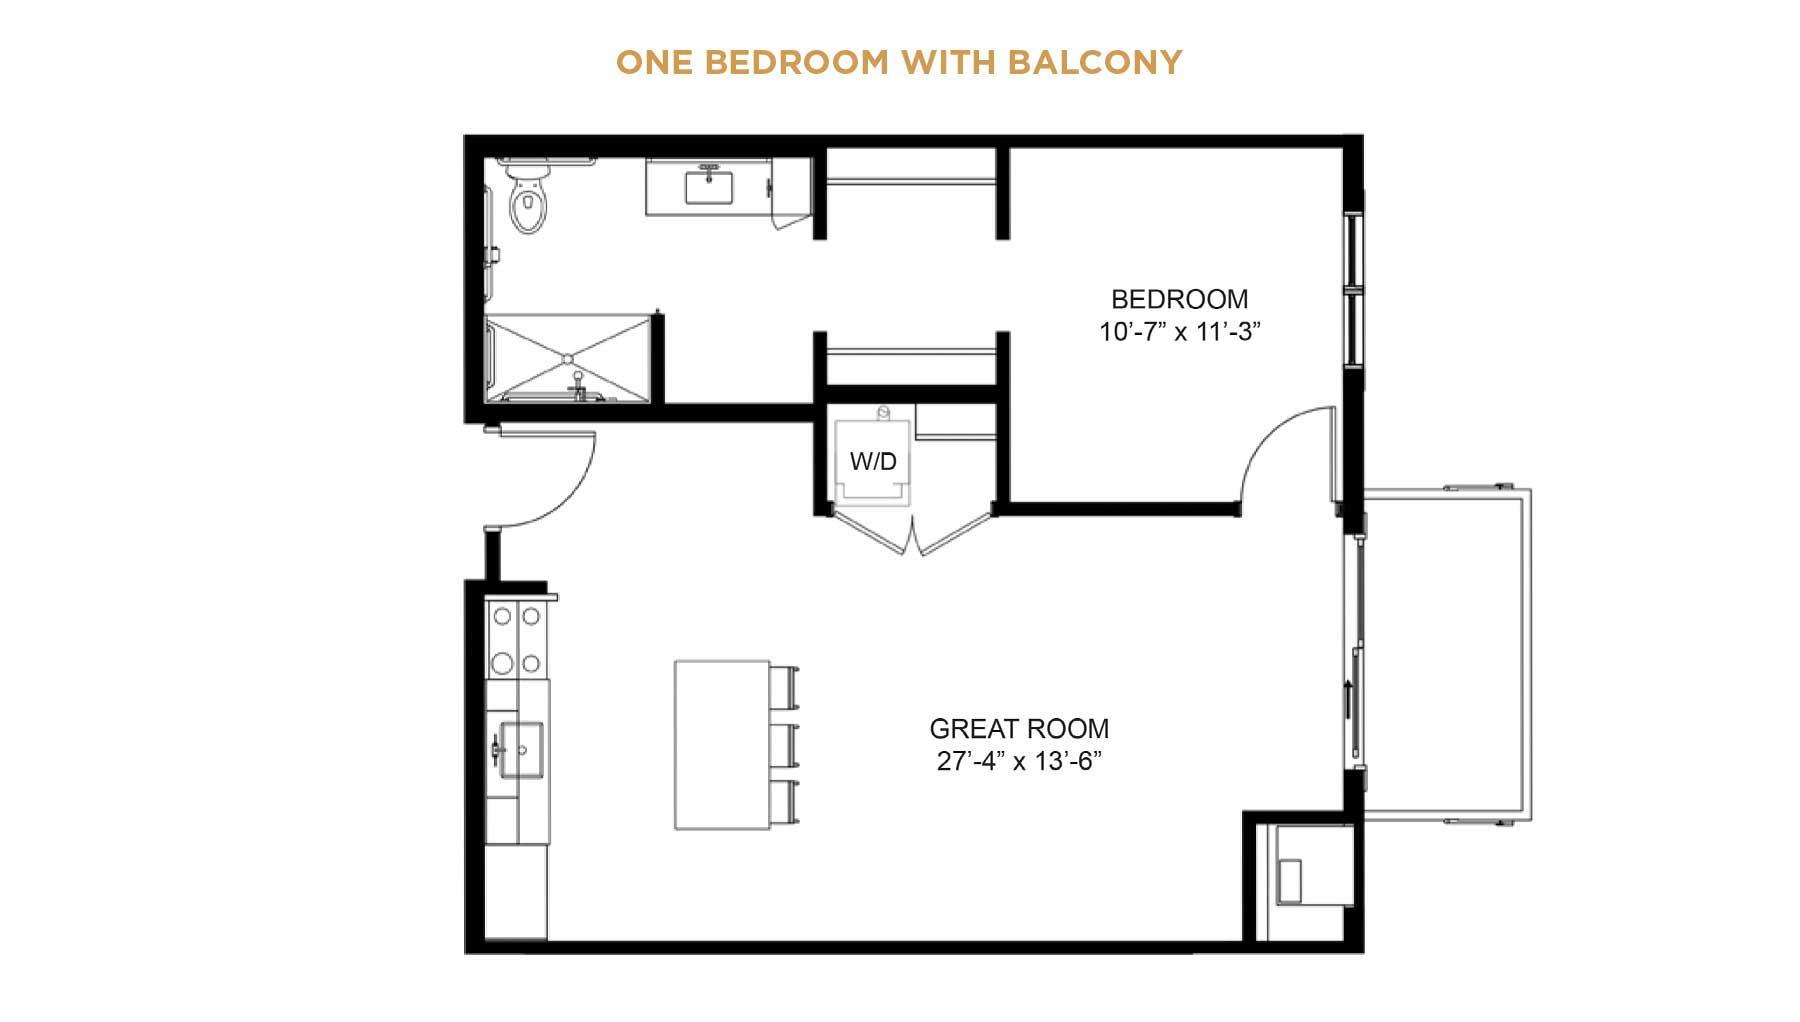 Senior Living one bedroom floor plan with balcony